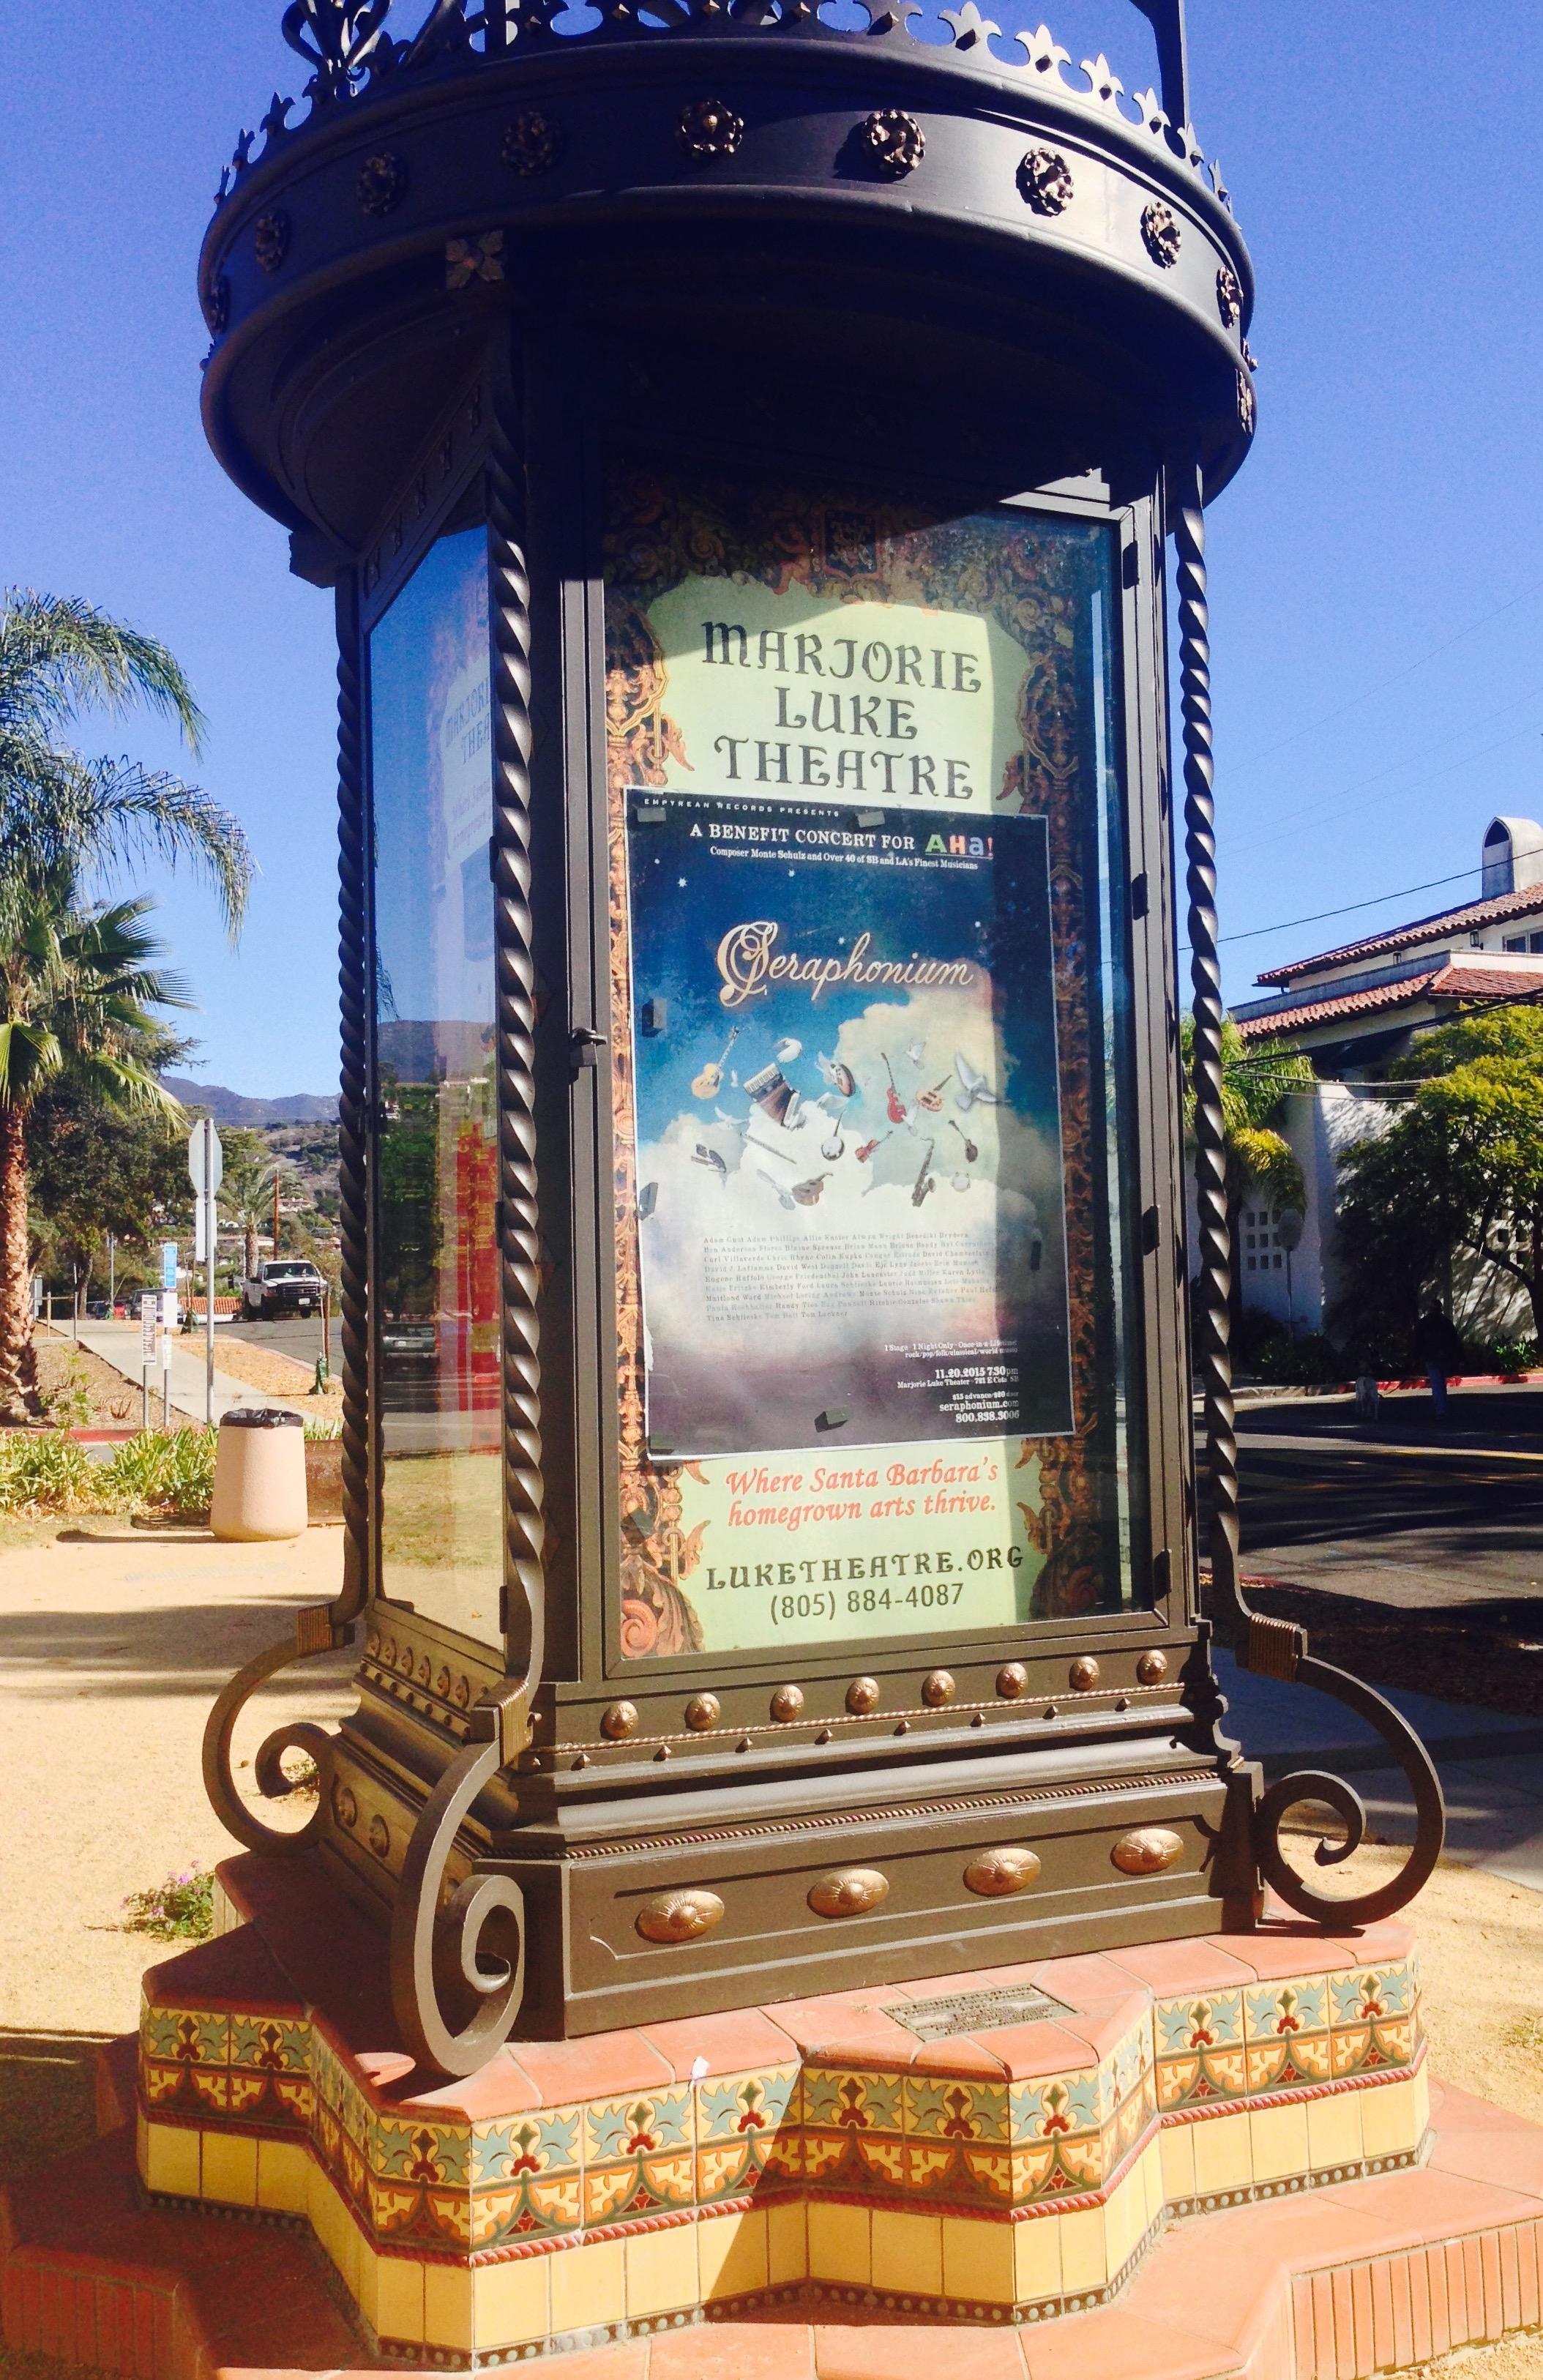 Seraphonium – Marjorie Luke Theatre Kiosk2